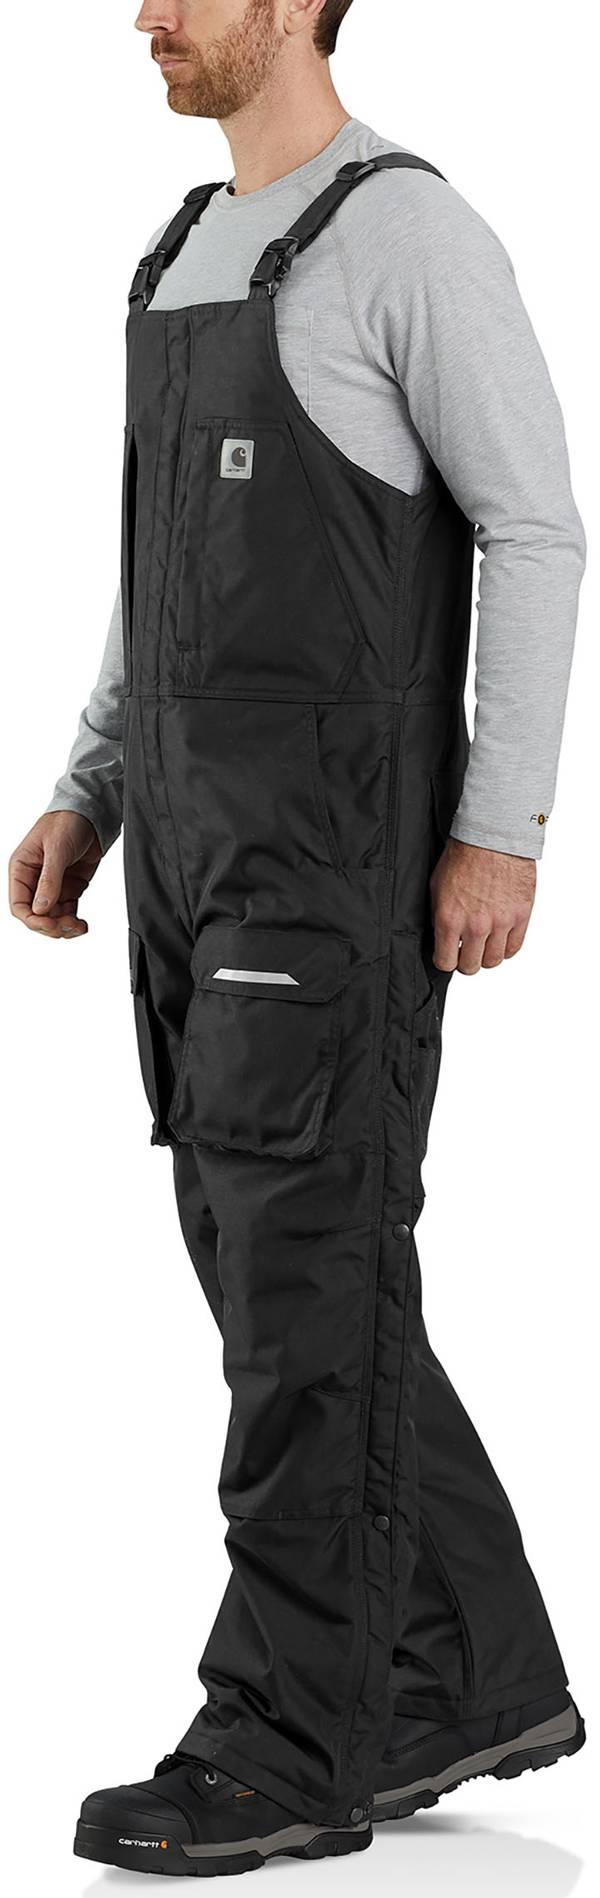 Carhartt Men's Yukon Extremes Insulated Biberall product image